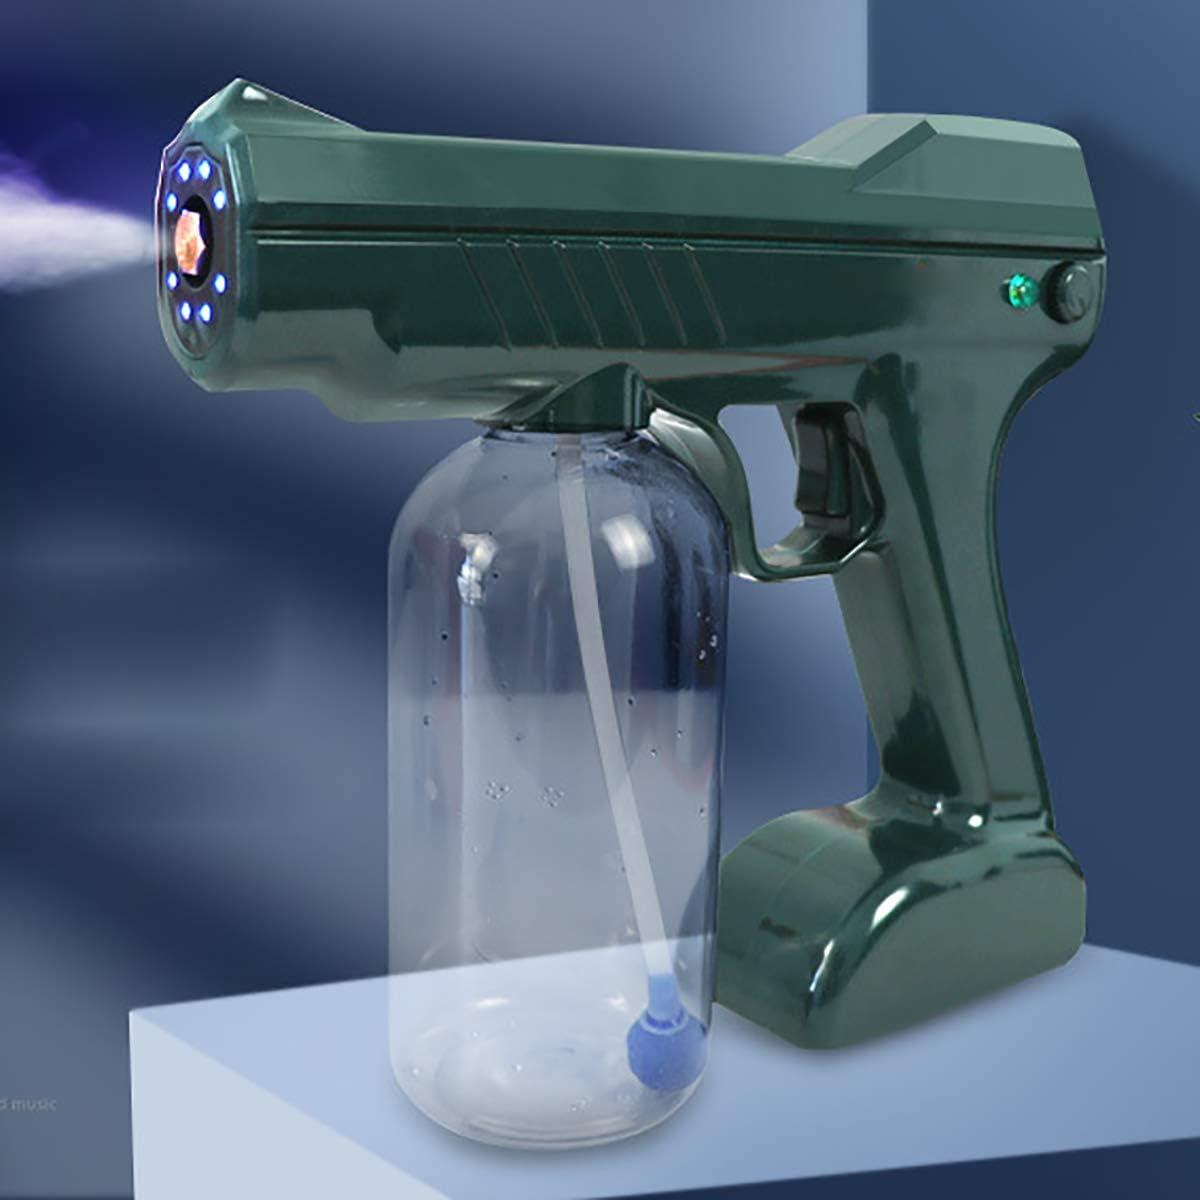 FIZZENN Aerosol Azul Claro Nano atomización Pistola eléctrica (110-240), eléctrico ULV pulverizador portátil Fogger Máquina para el Hospital Escuela de Coches, Desinfección, humidificación y Limpieza